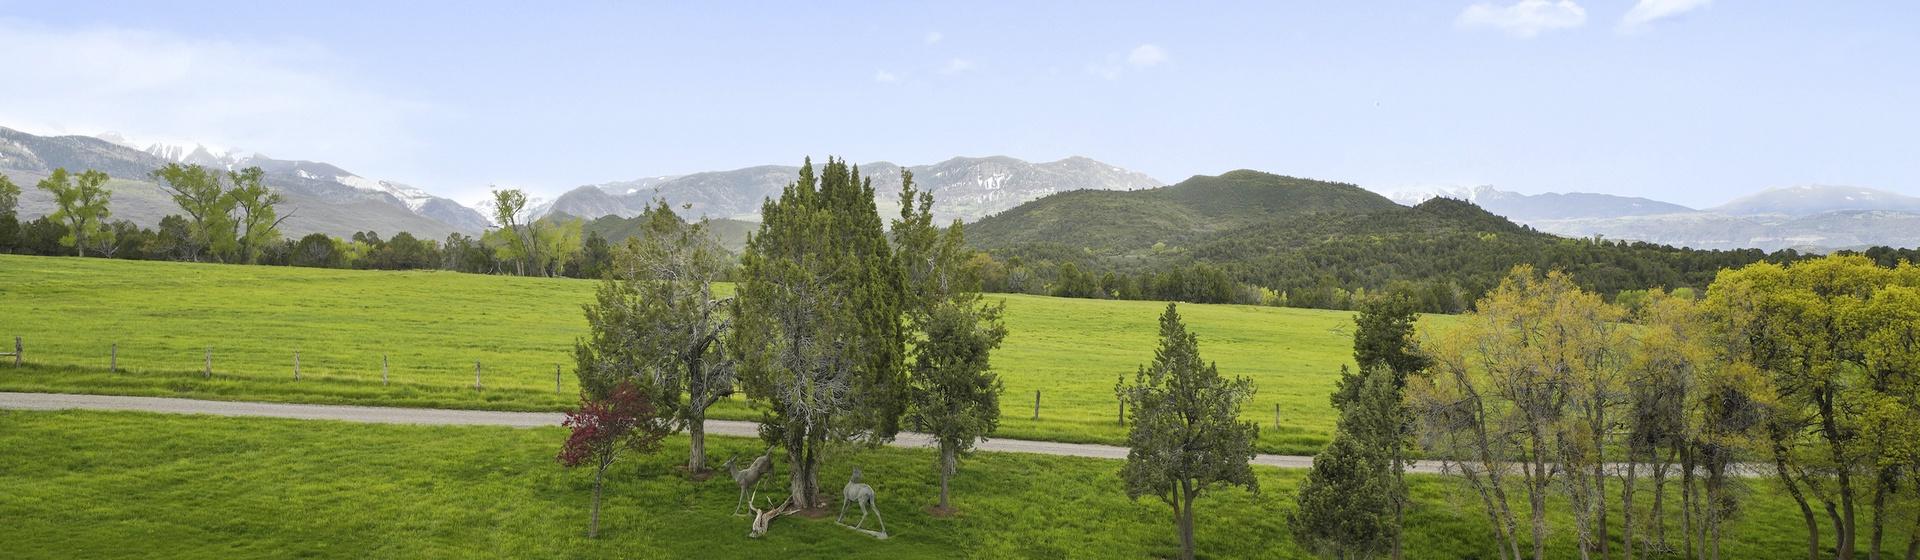 13.7-Telluride-Sleeping-Indian-Ranch-view-web.JPG